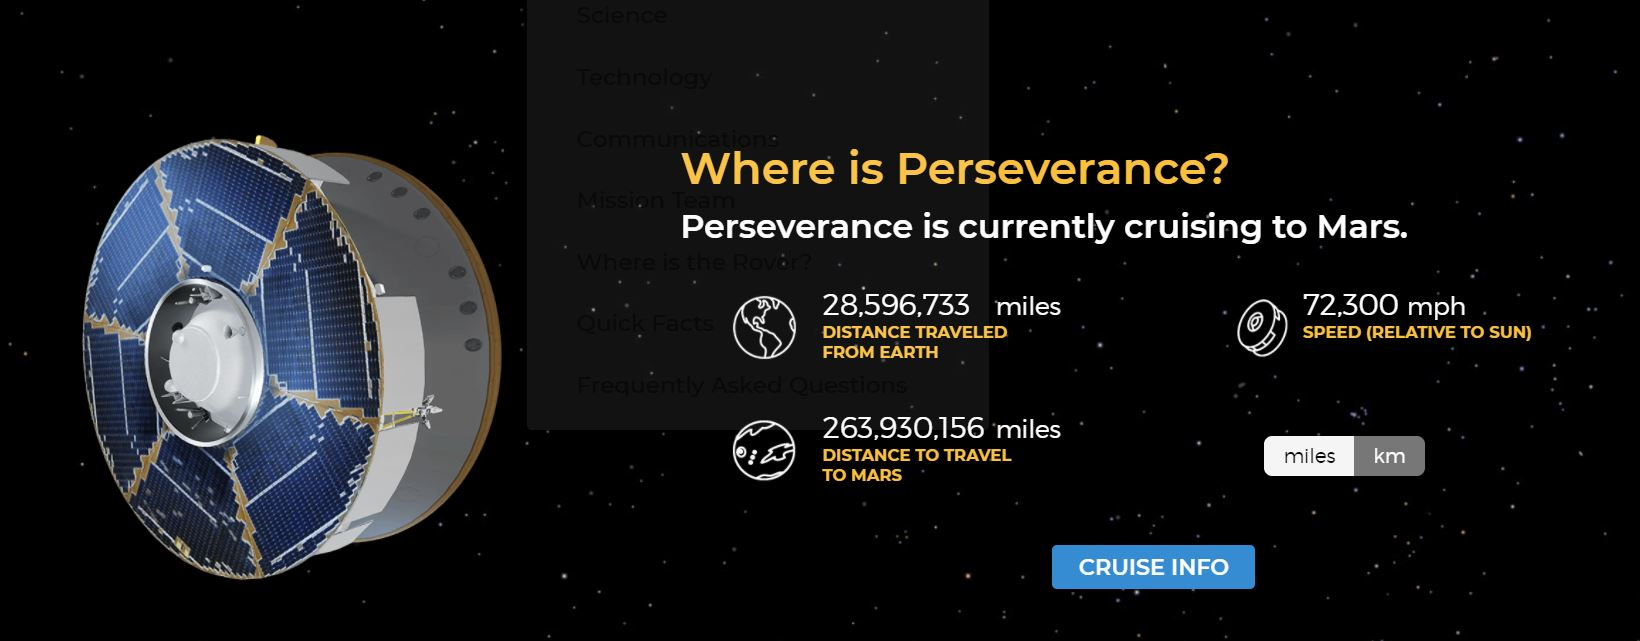 Mars-2020-Perseverance-Ingenuity-location_Aug2020_3